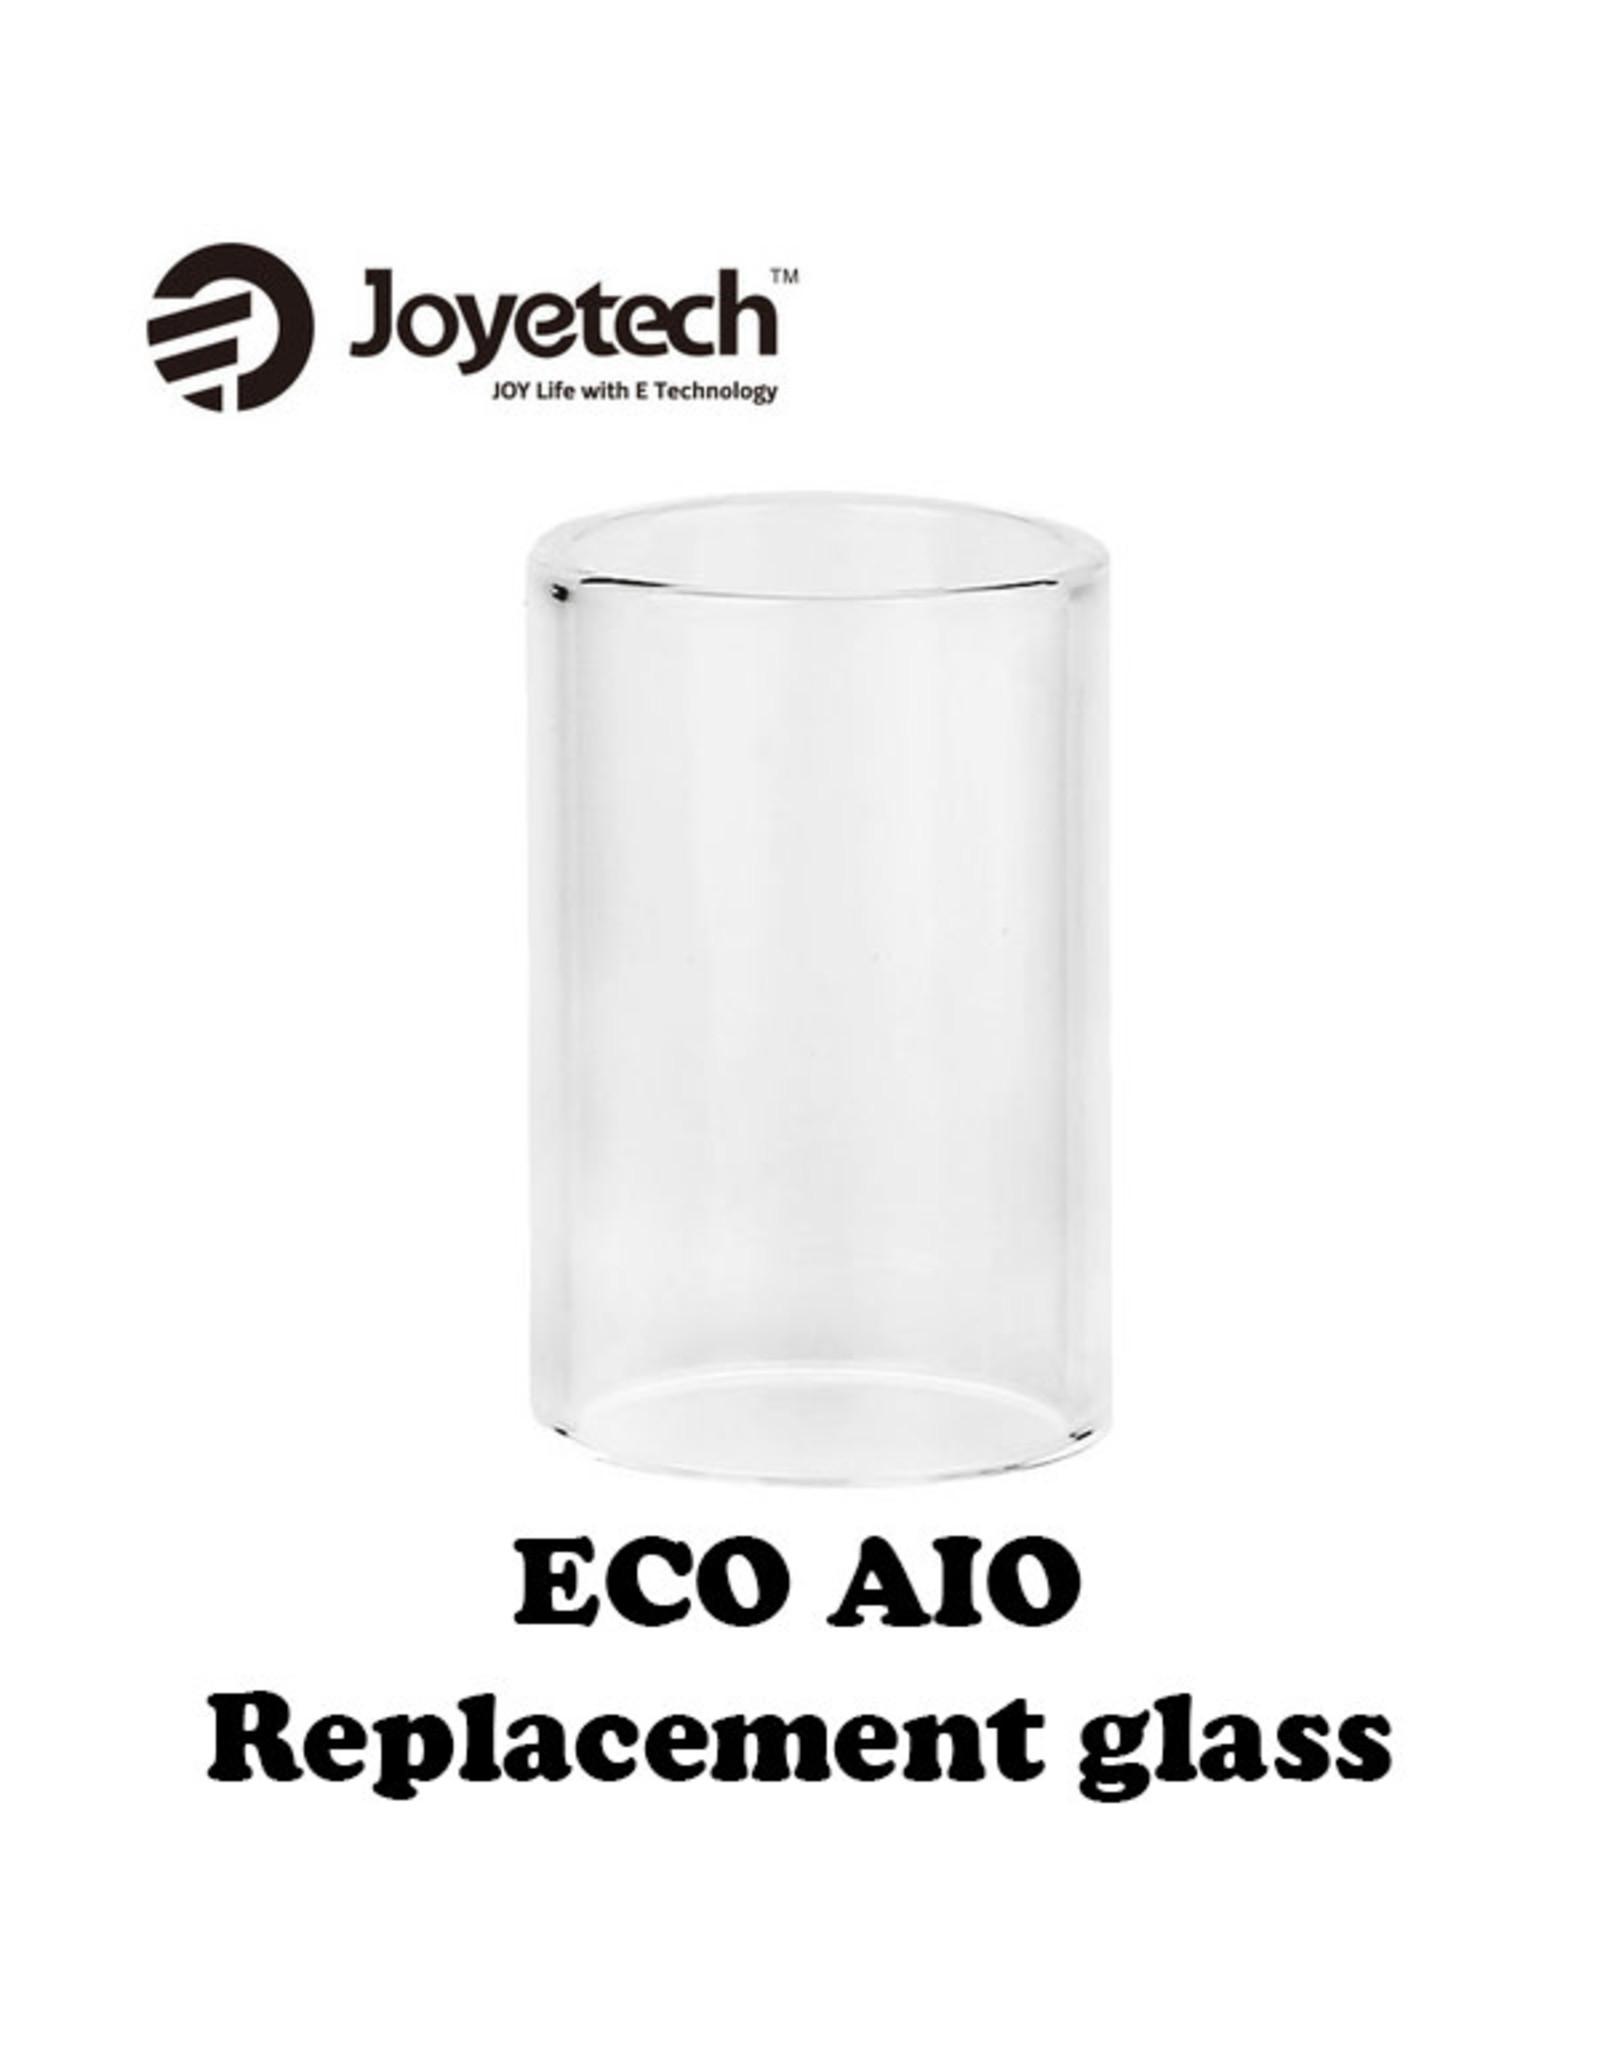 Joyetech eGo AIO ECO Replacement Glass